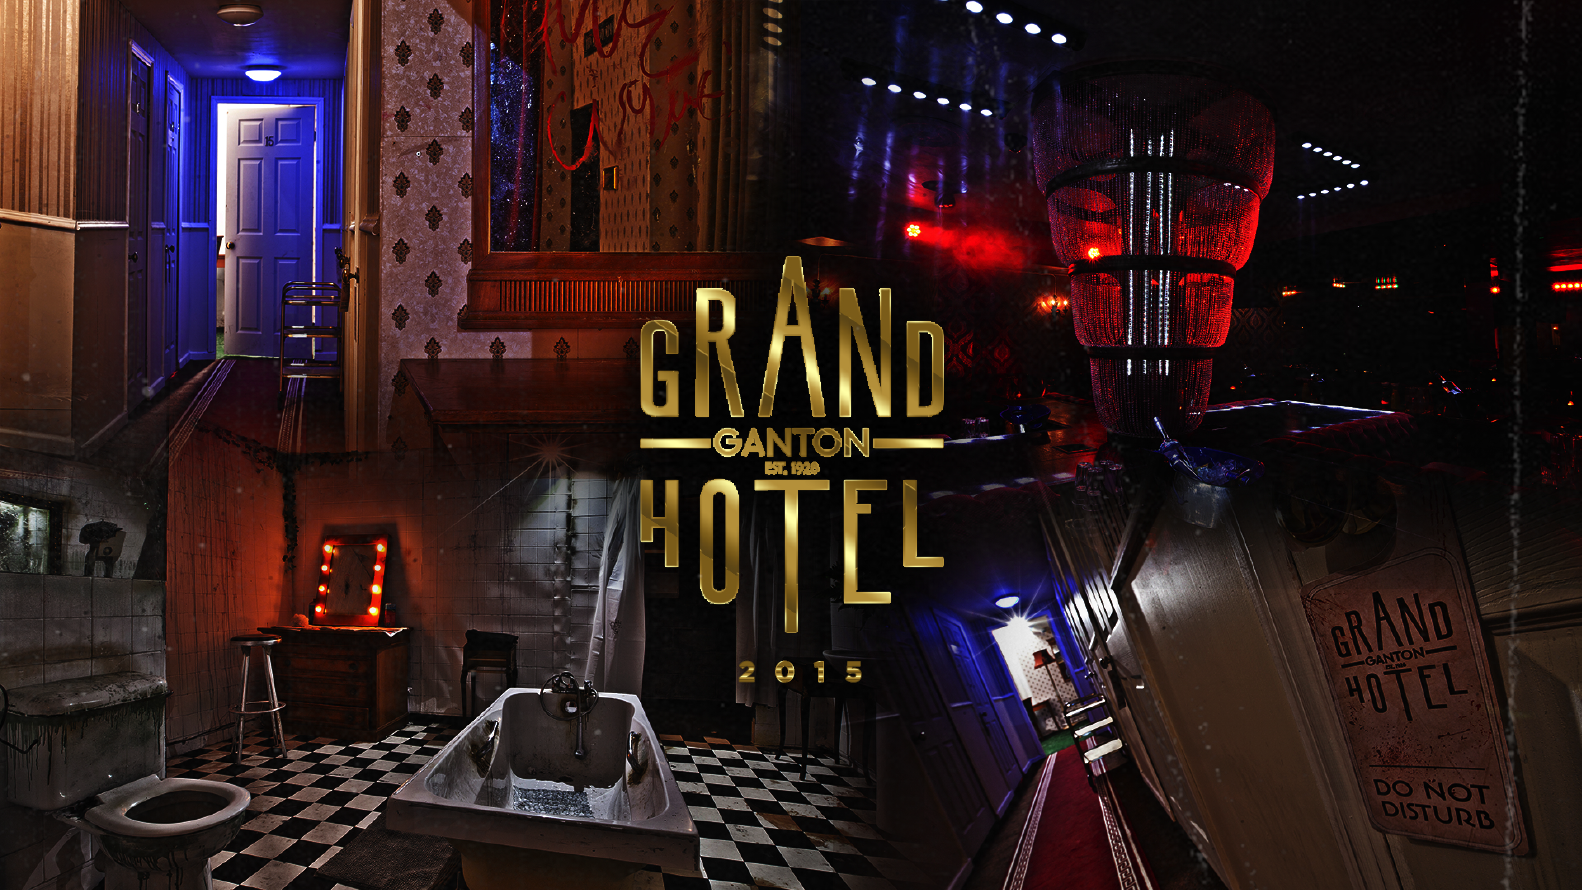 Grand Ganton Hotel 2015